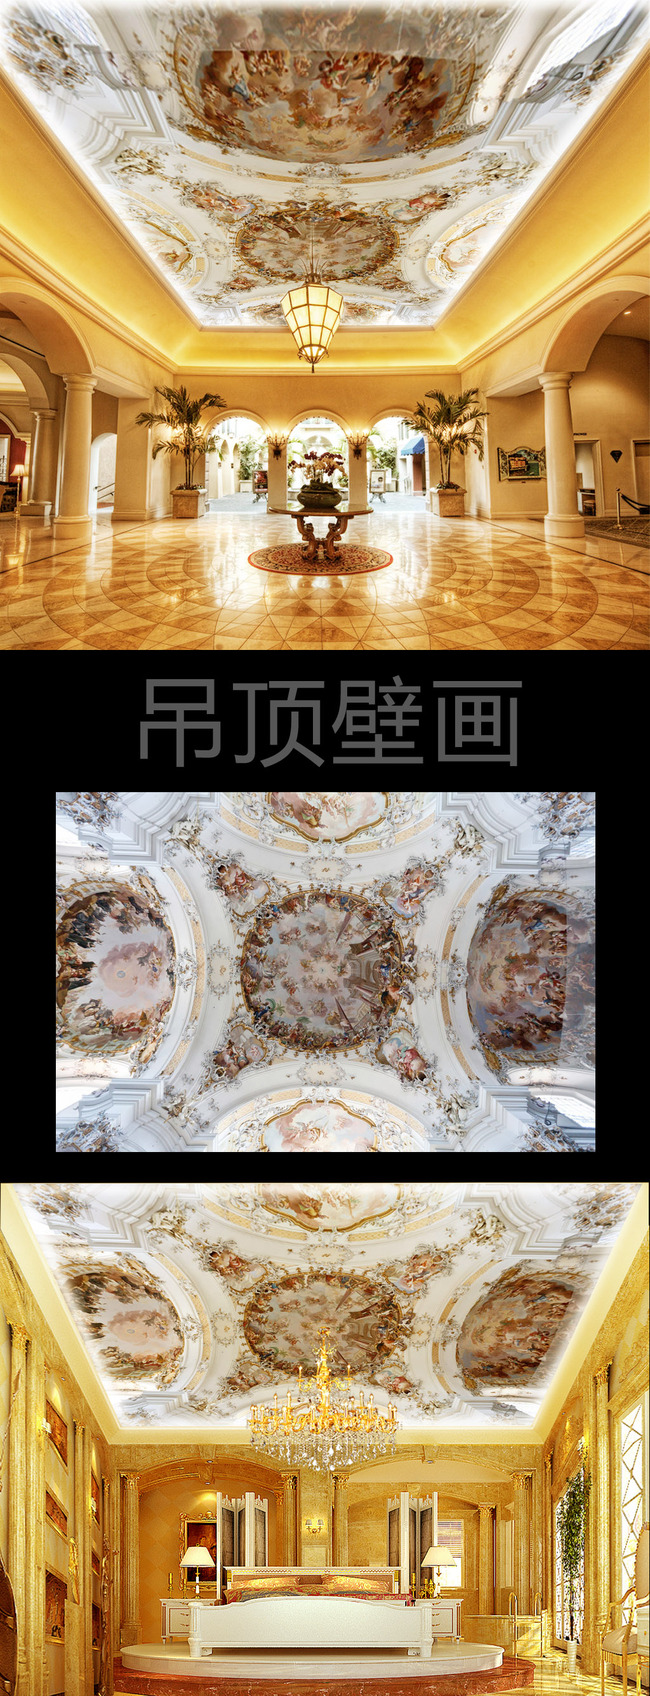 【tif不分层】欧式花纹古典时尚天花板吊顶设计装修效果图